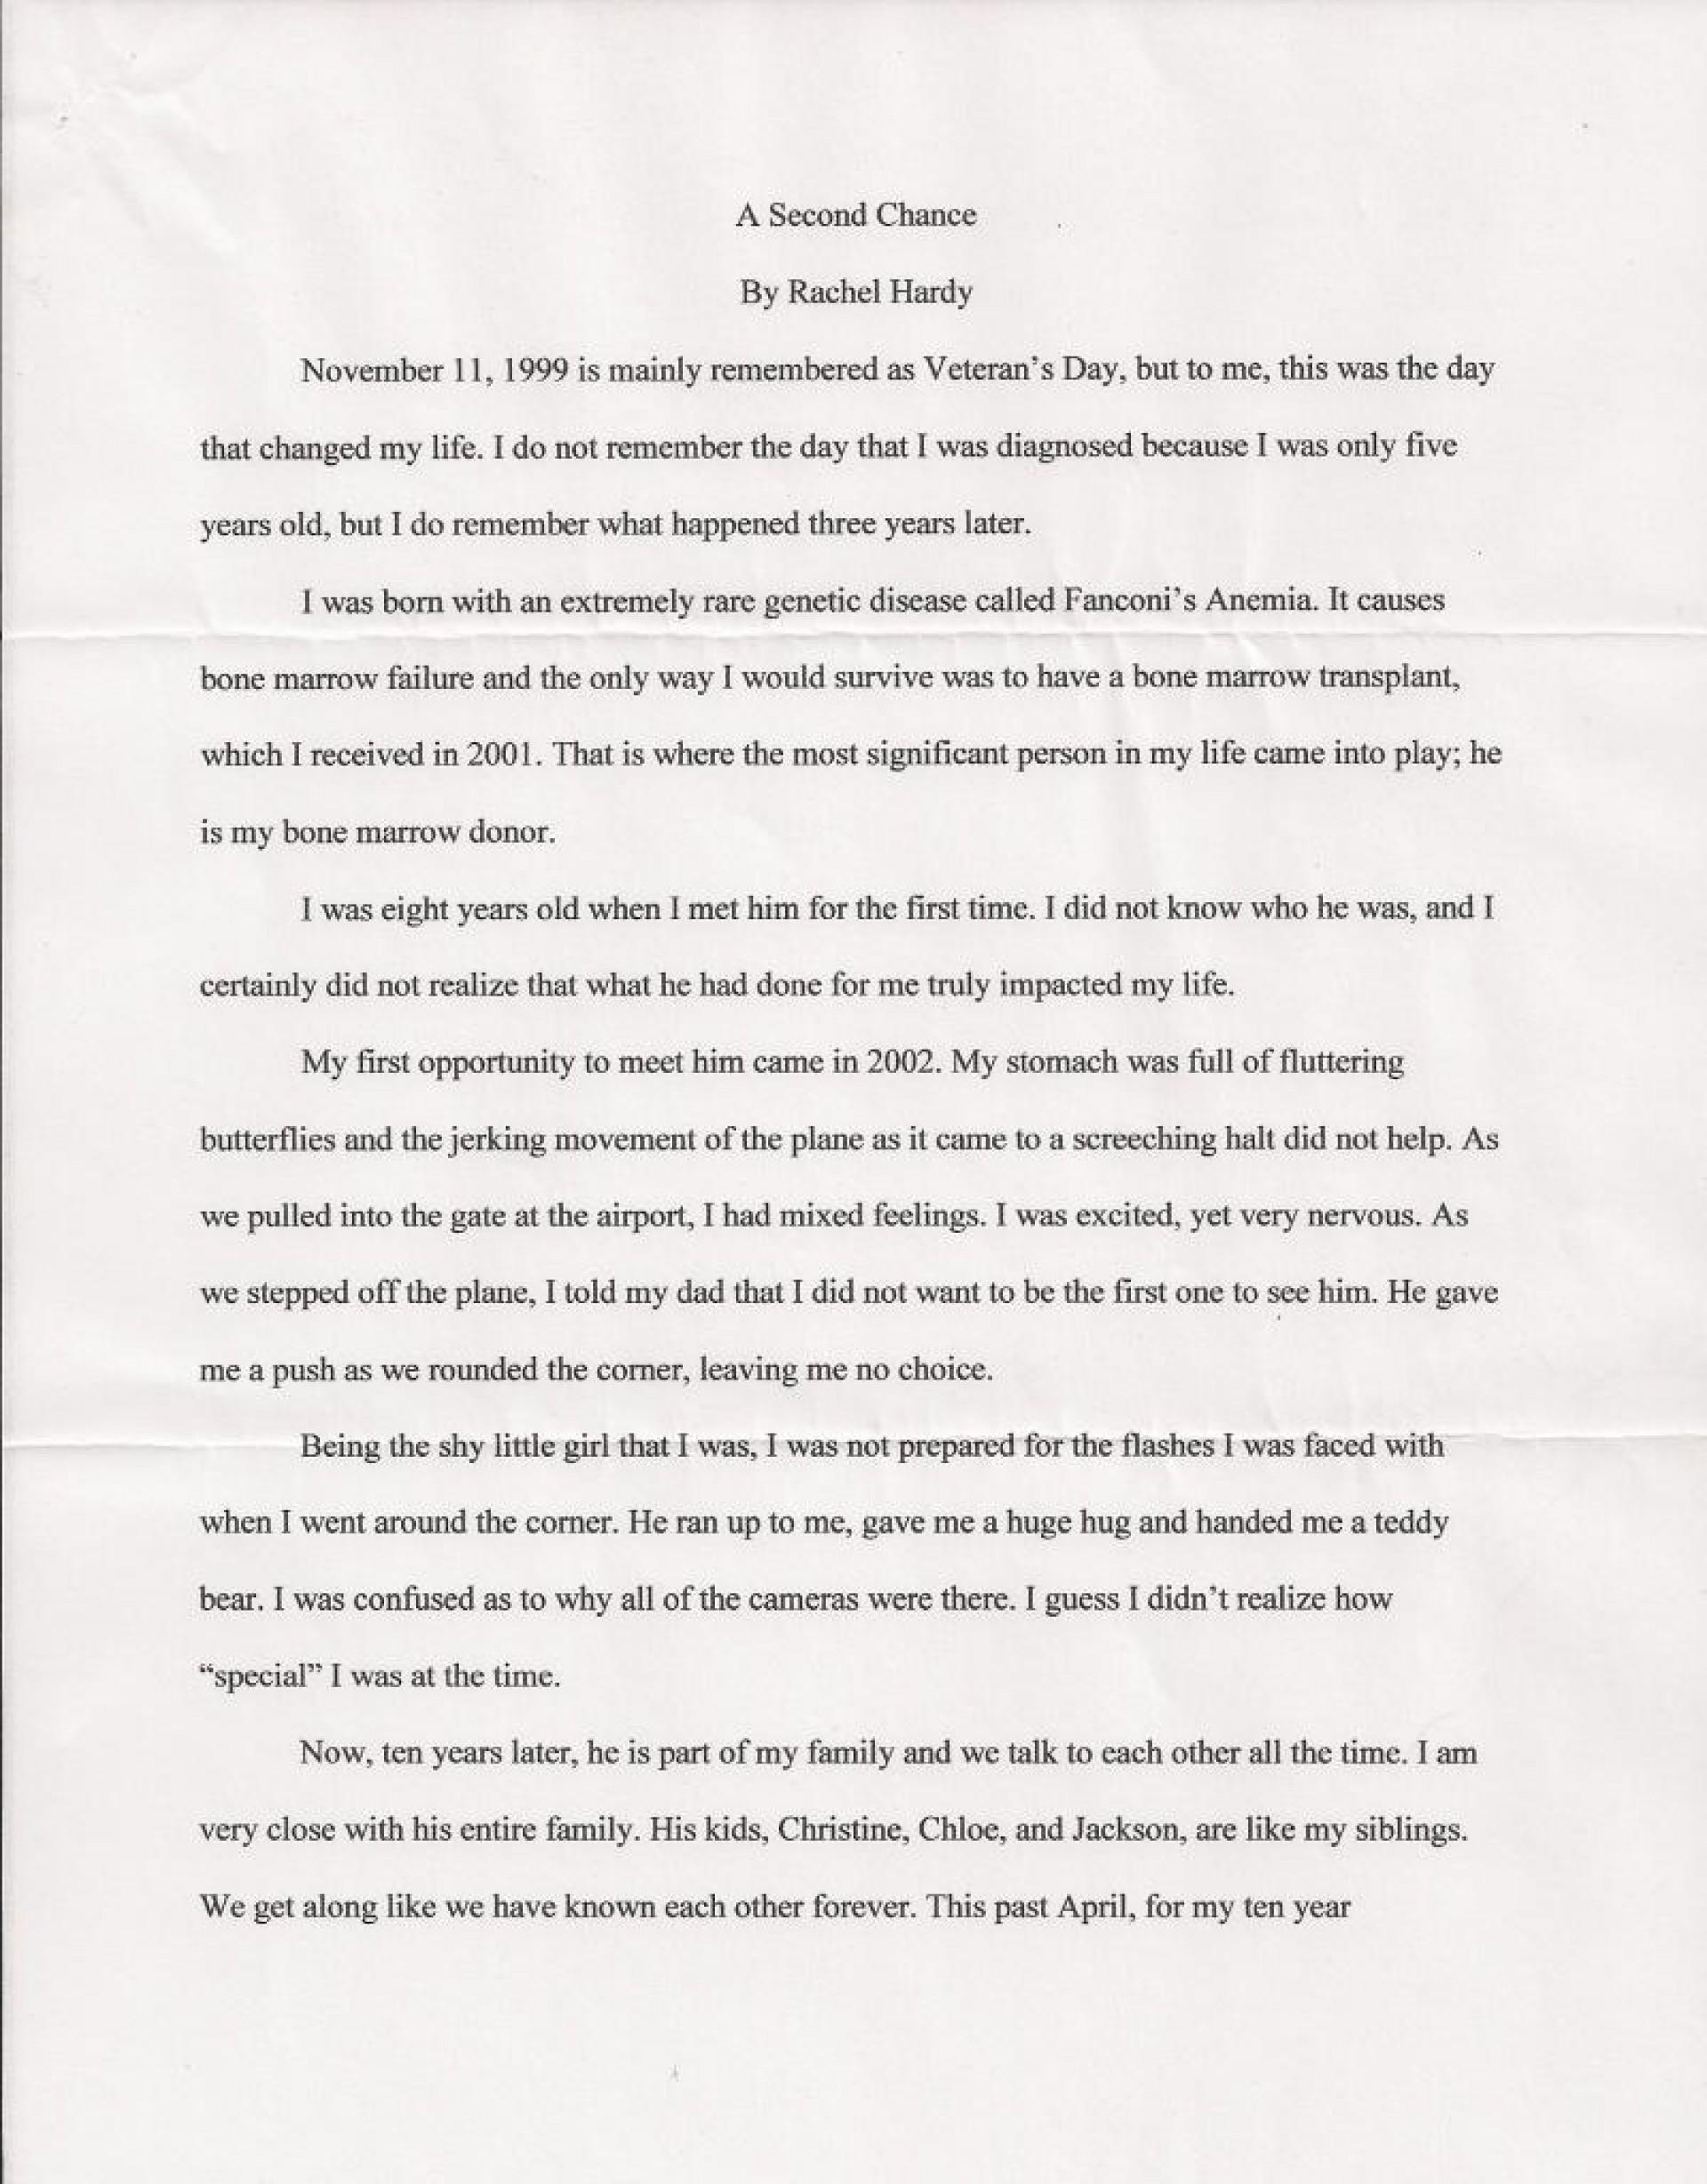 005 Essay Example College Scholarship Rachel Hardy 1 206151151 Std Best Topics List Template Tips 1920